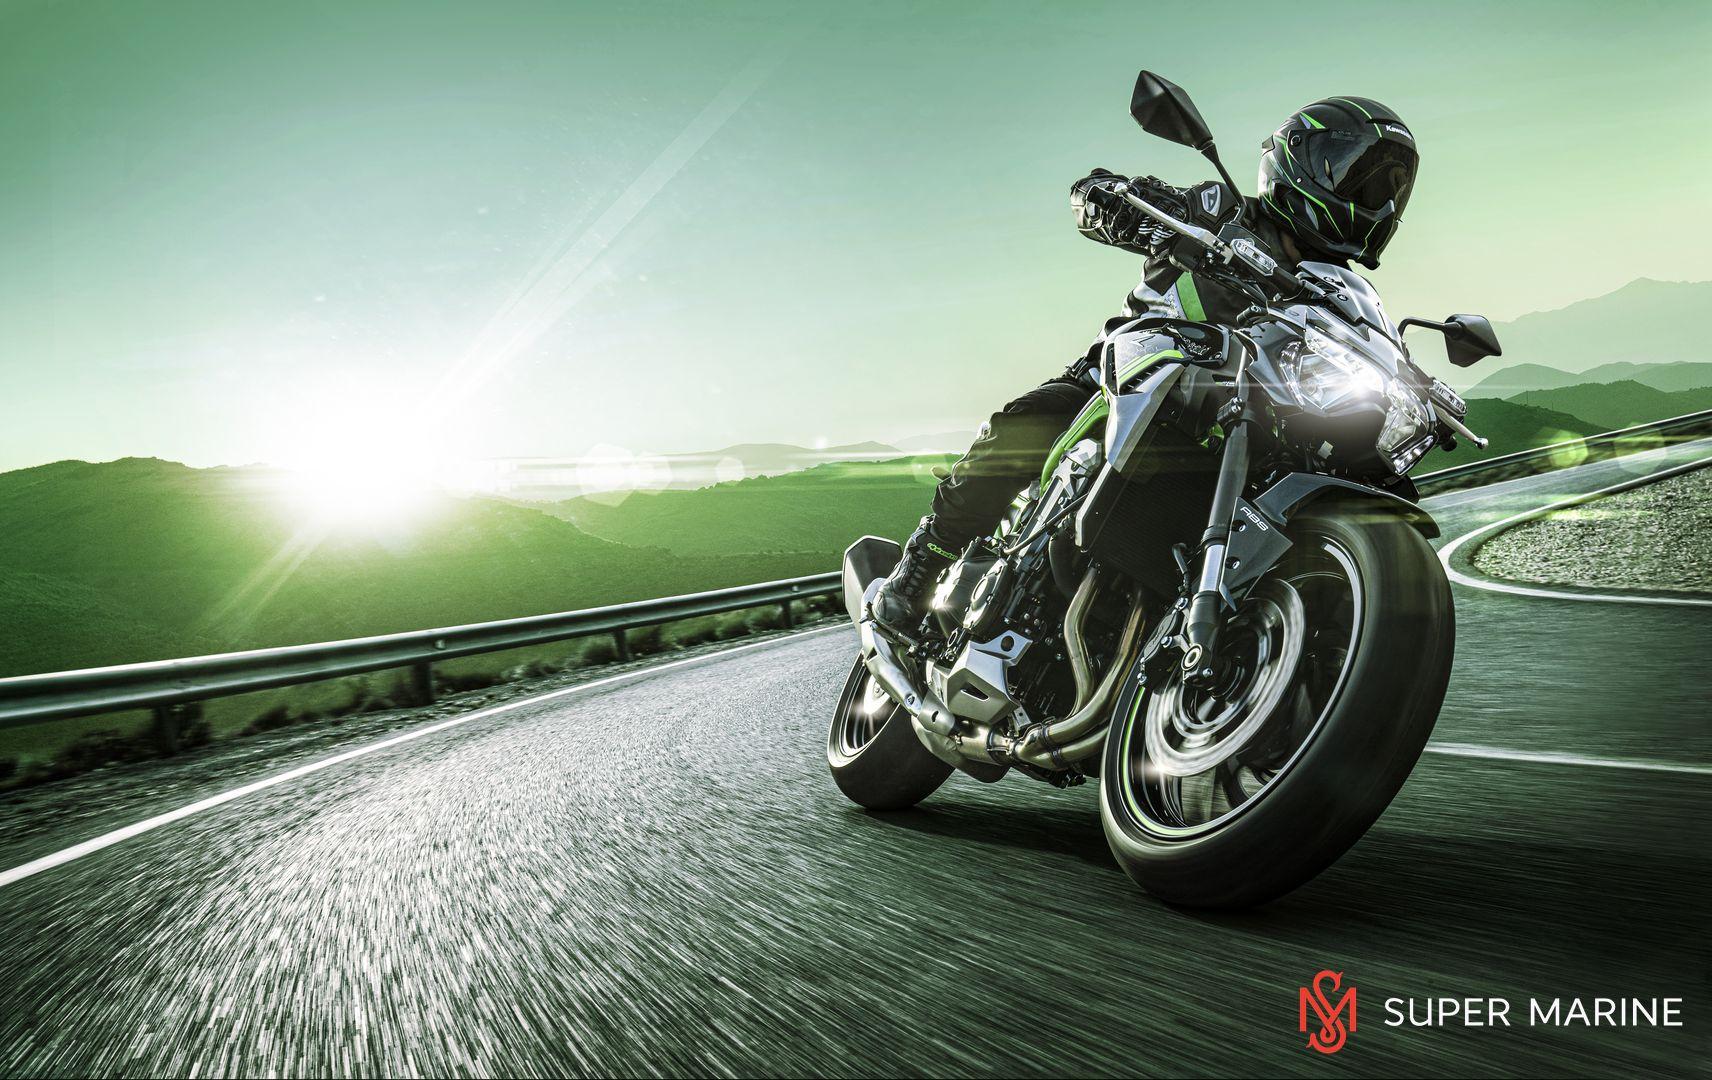 Мотоцикл Kawasaki Z900 ABS Чёрный 2020 - 9